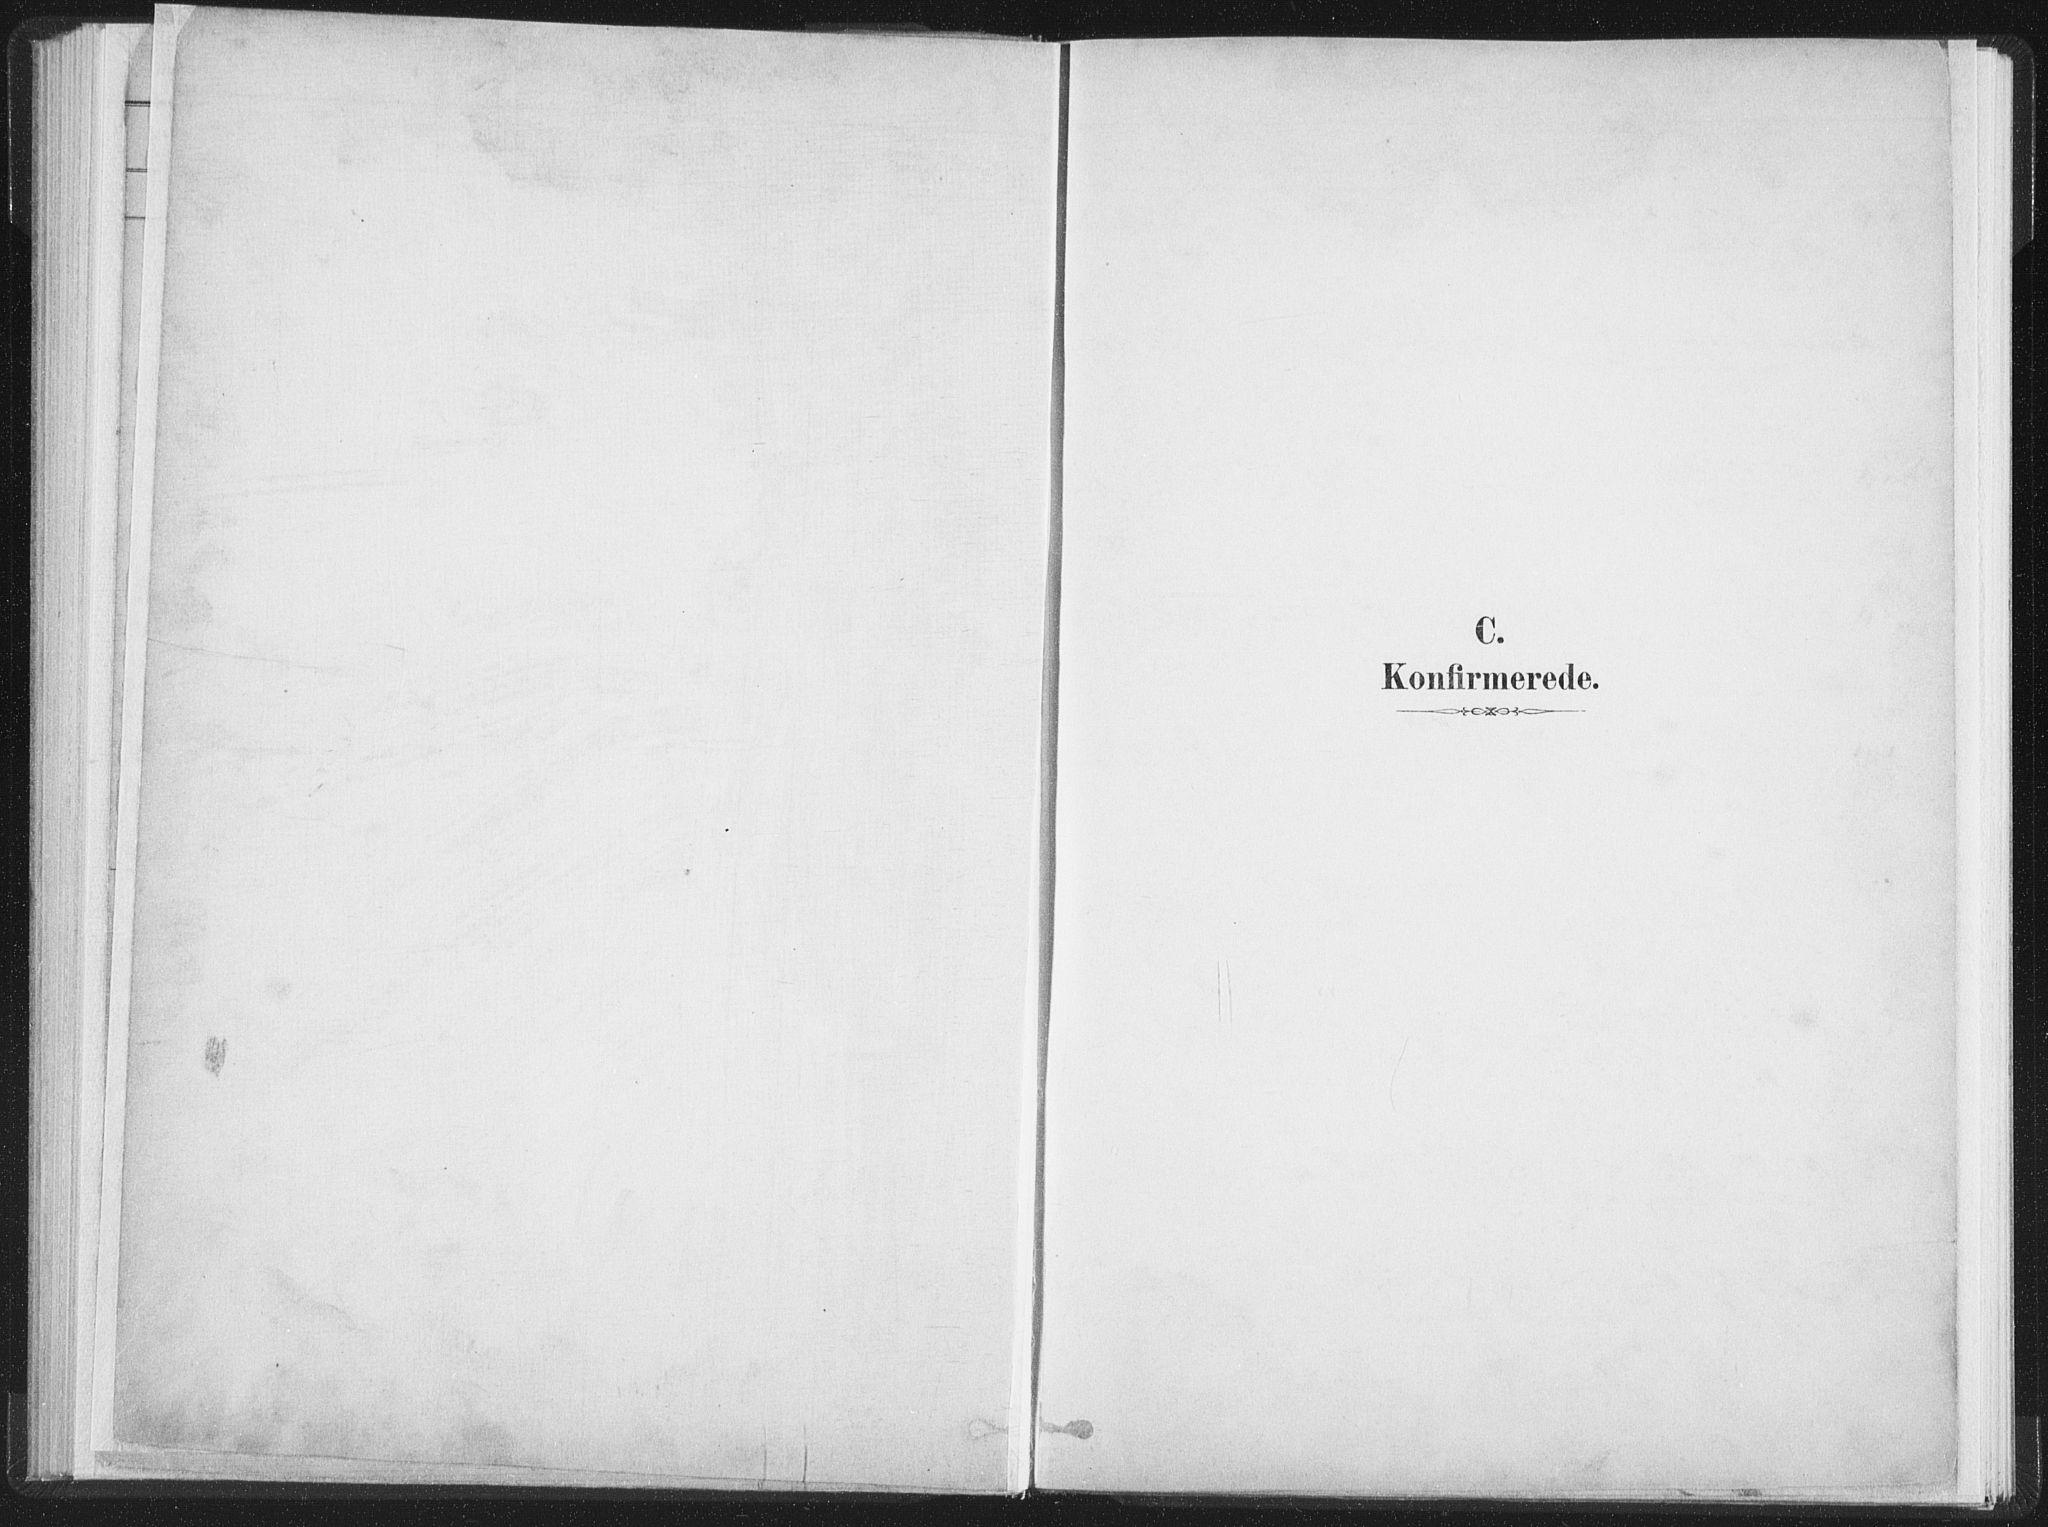 SAT, Ministerialprotokoller, klokkerbøker og fødselsregistre - Nordland, 890/L1286: Ministerialbok nr. 890A01, 1882-1902